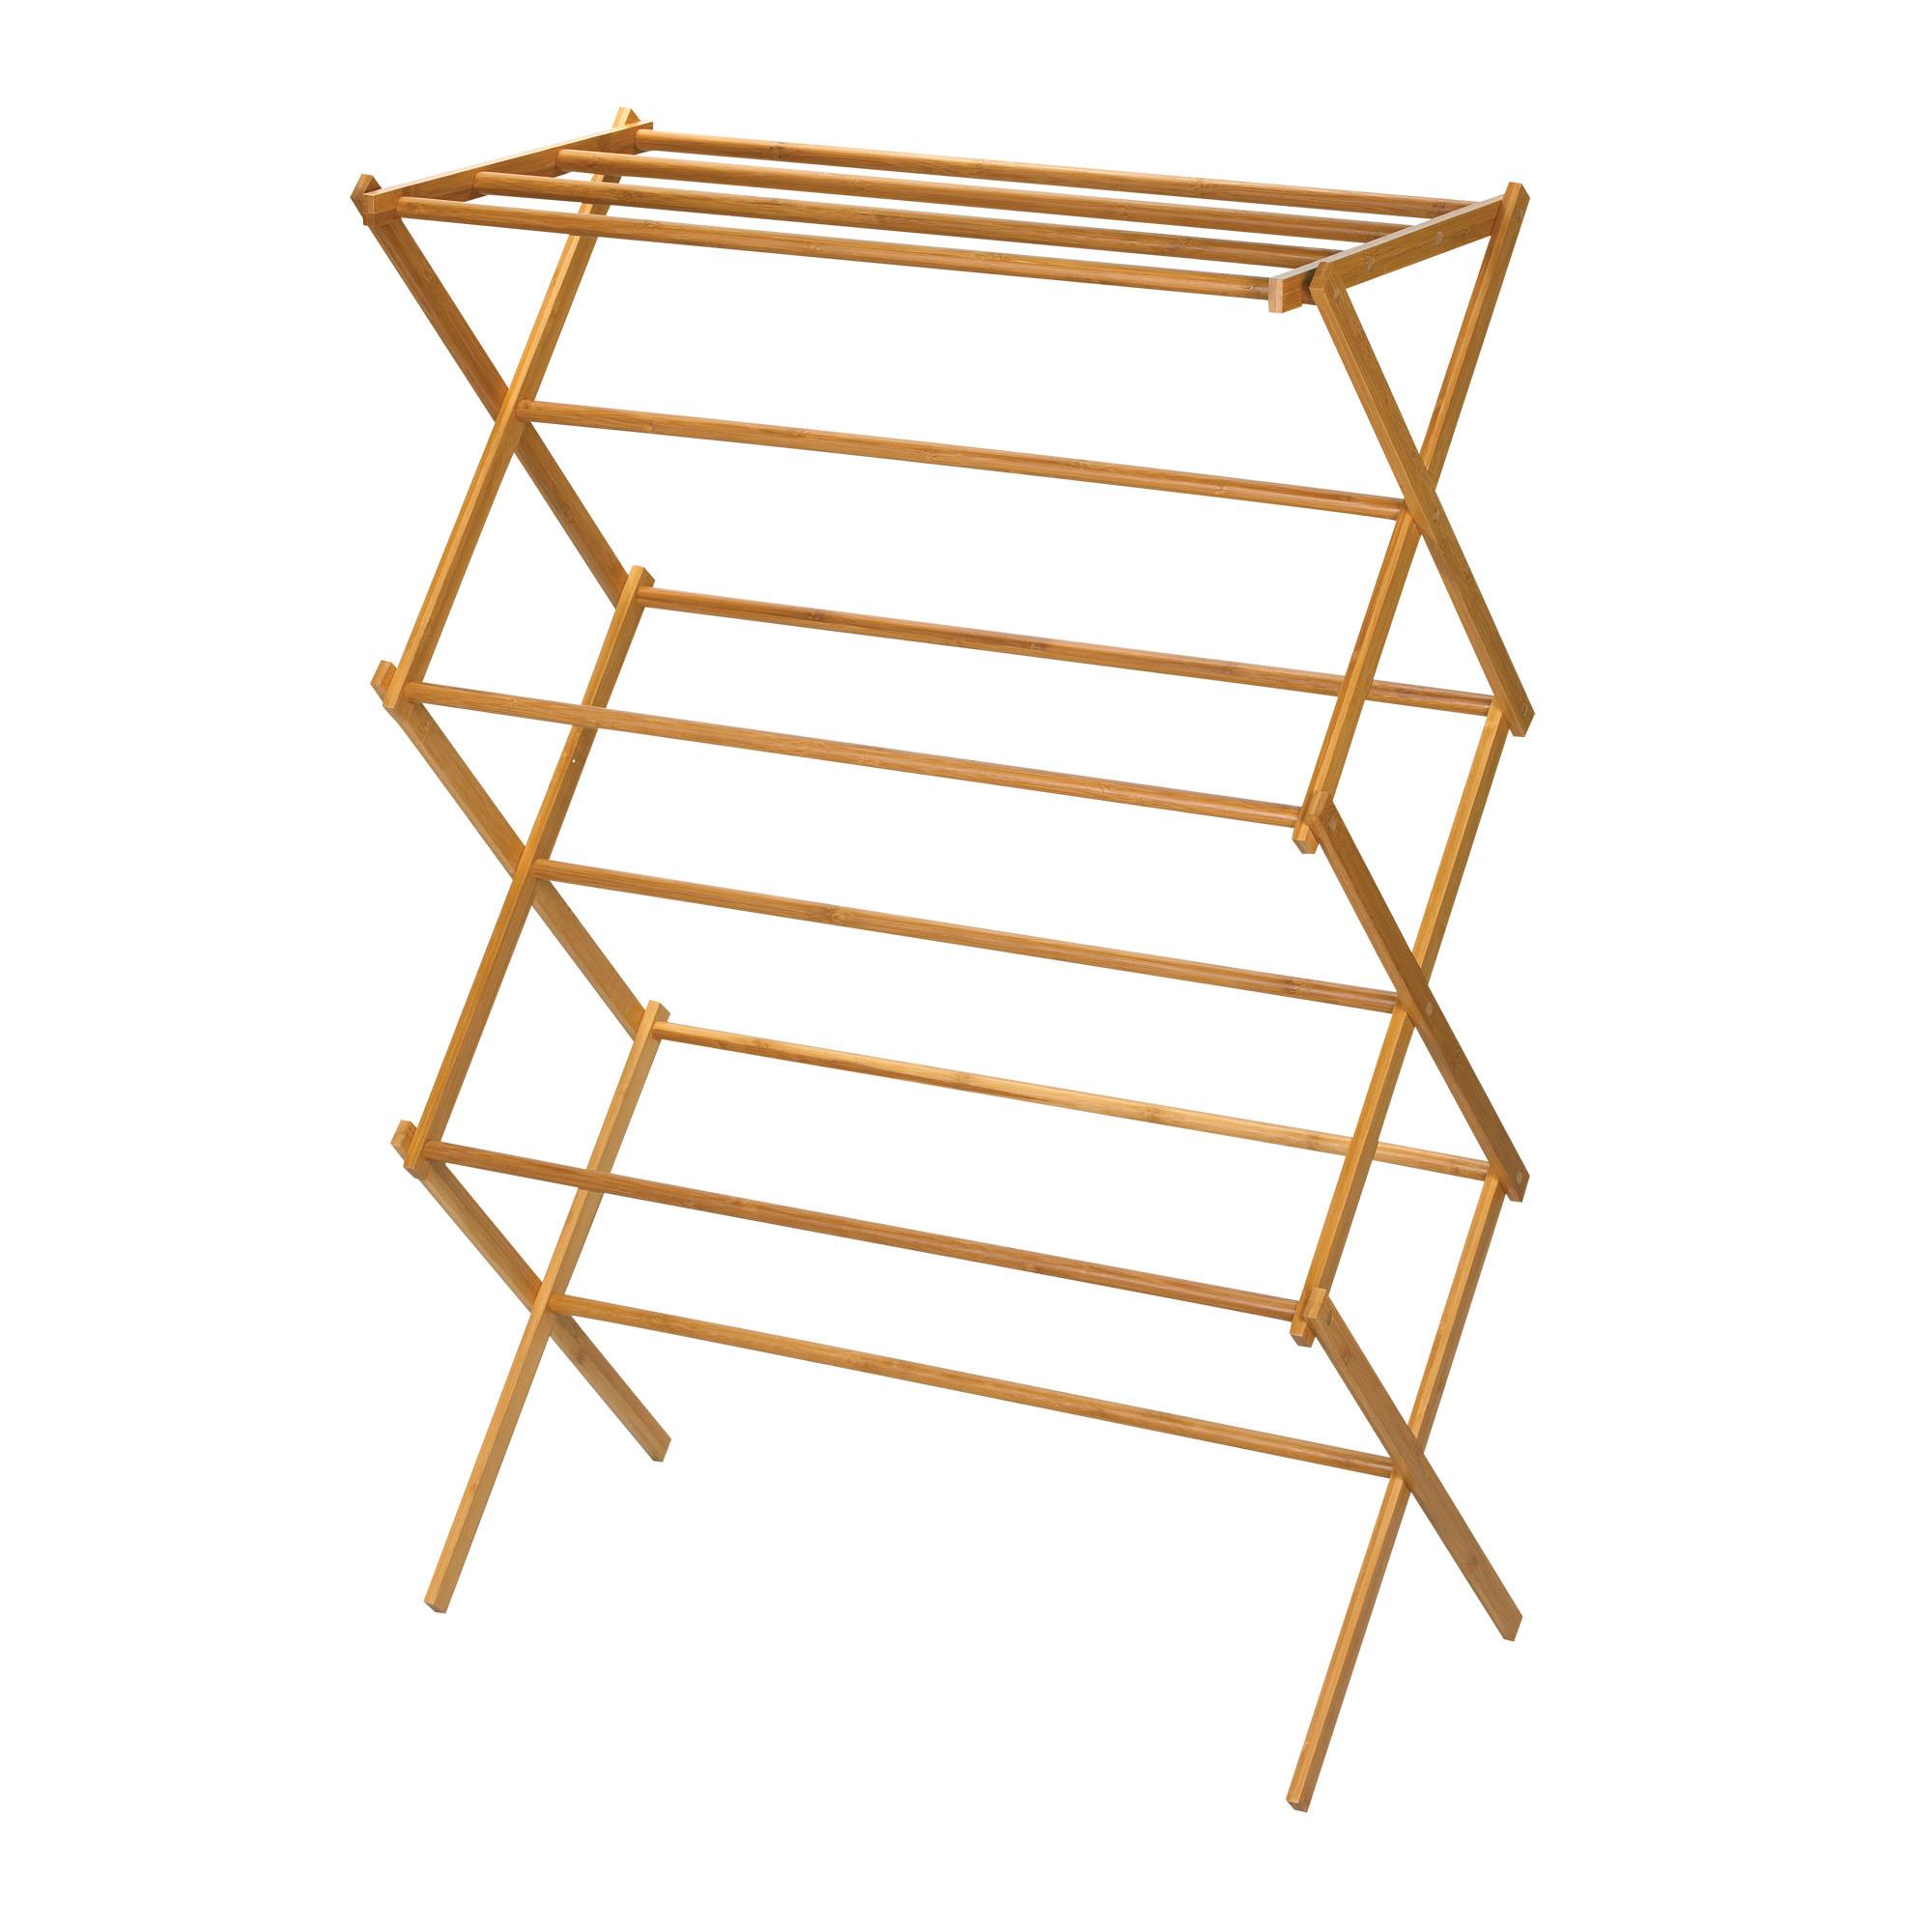 Bamboo Dryer